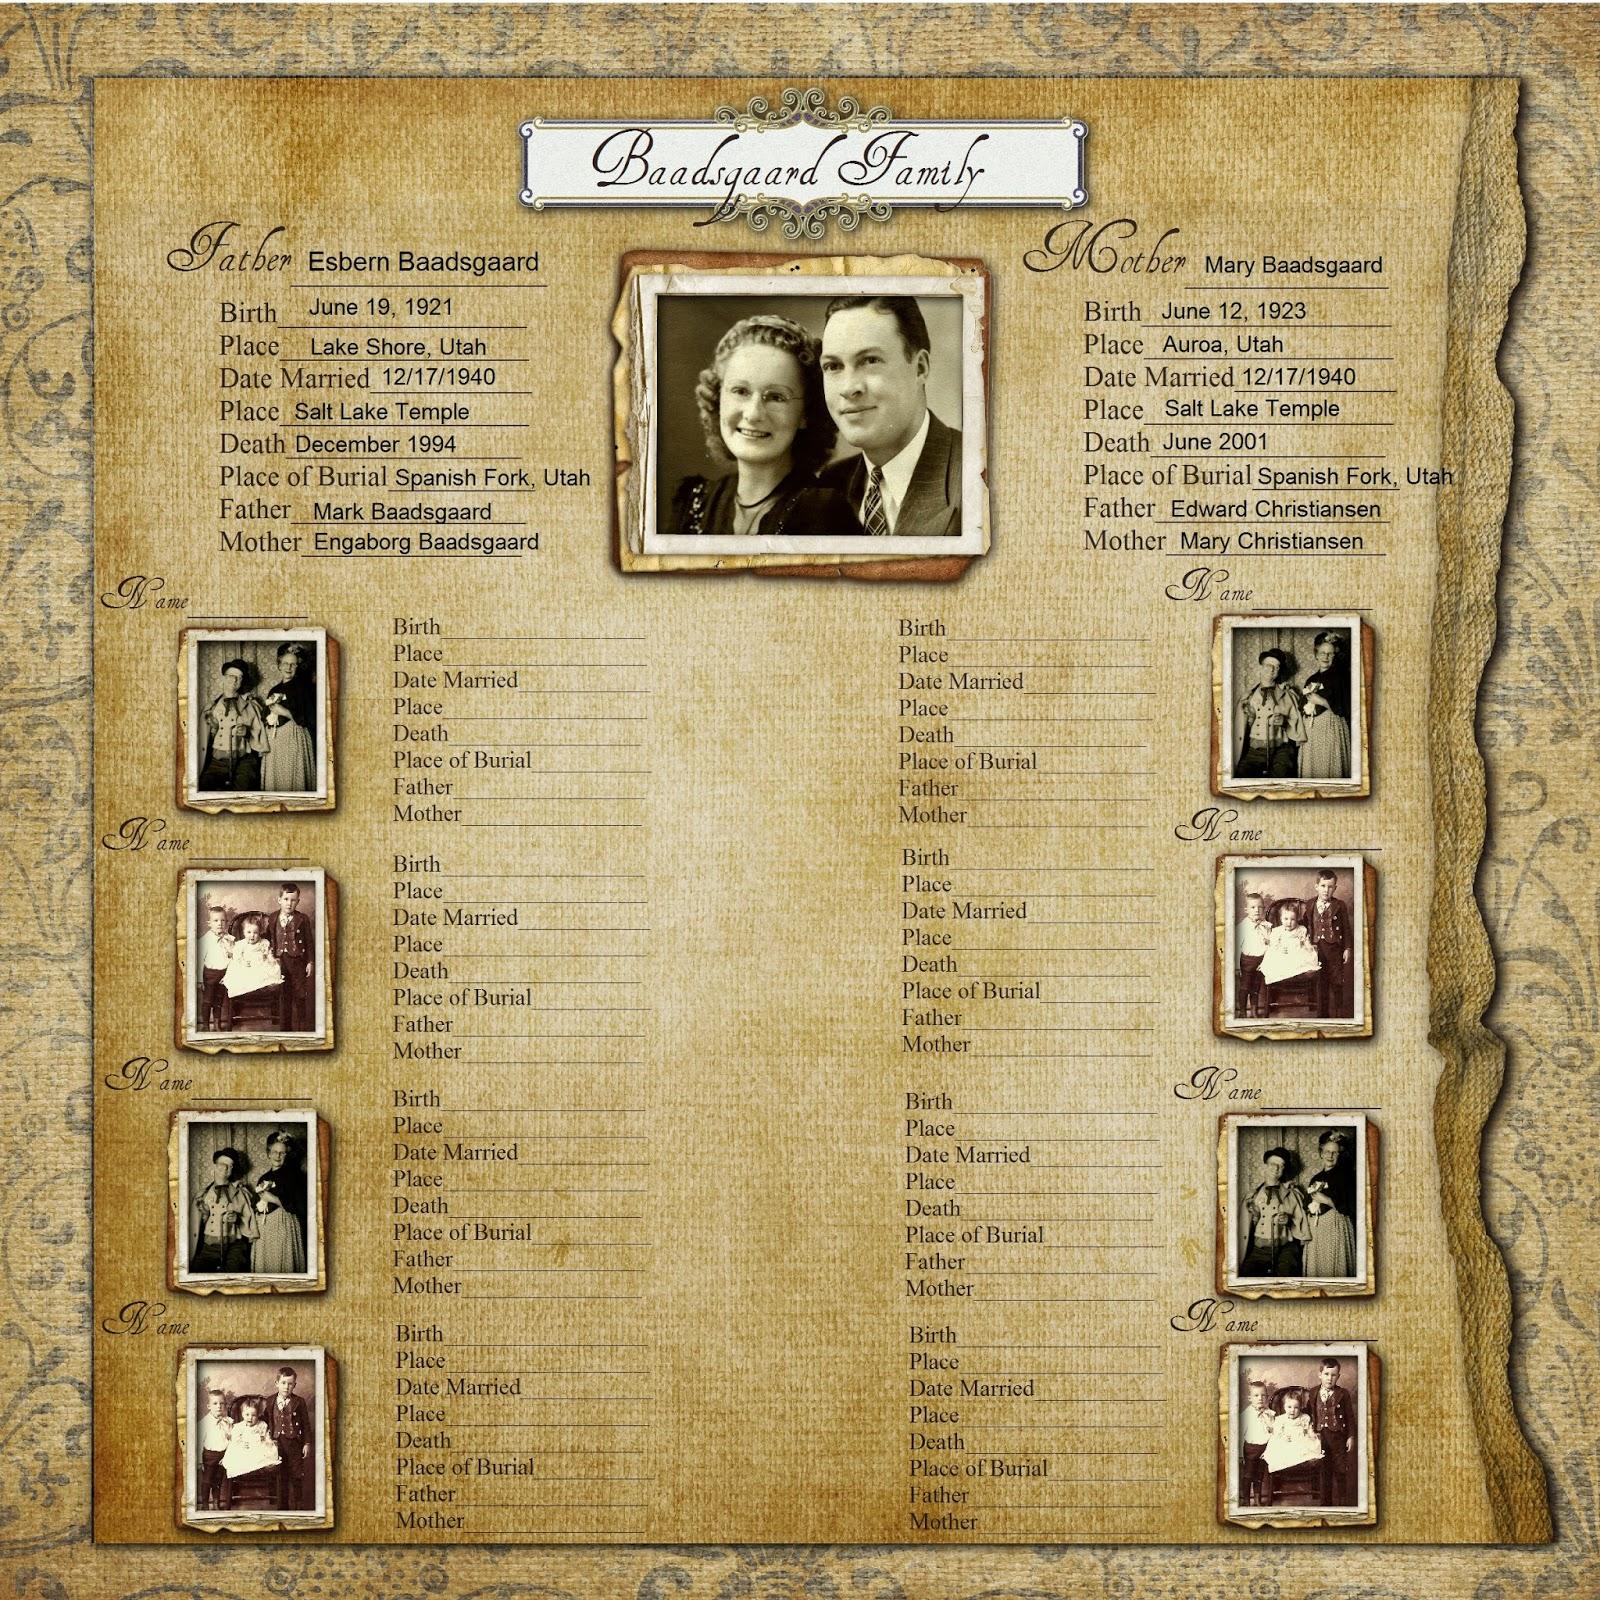 ancestry book templates - geneawebinars make a free family history chart free webinar